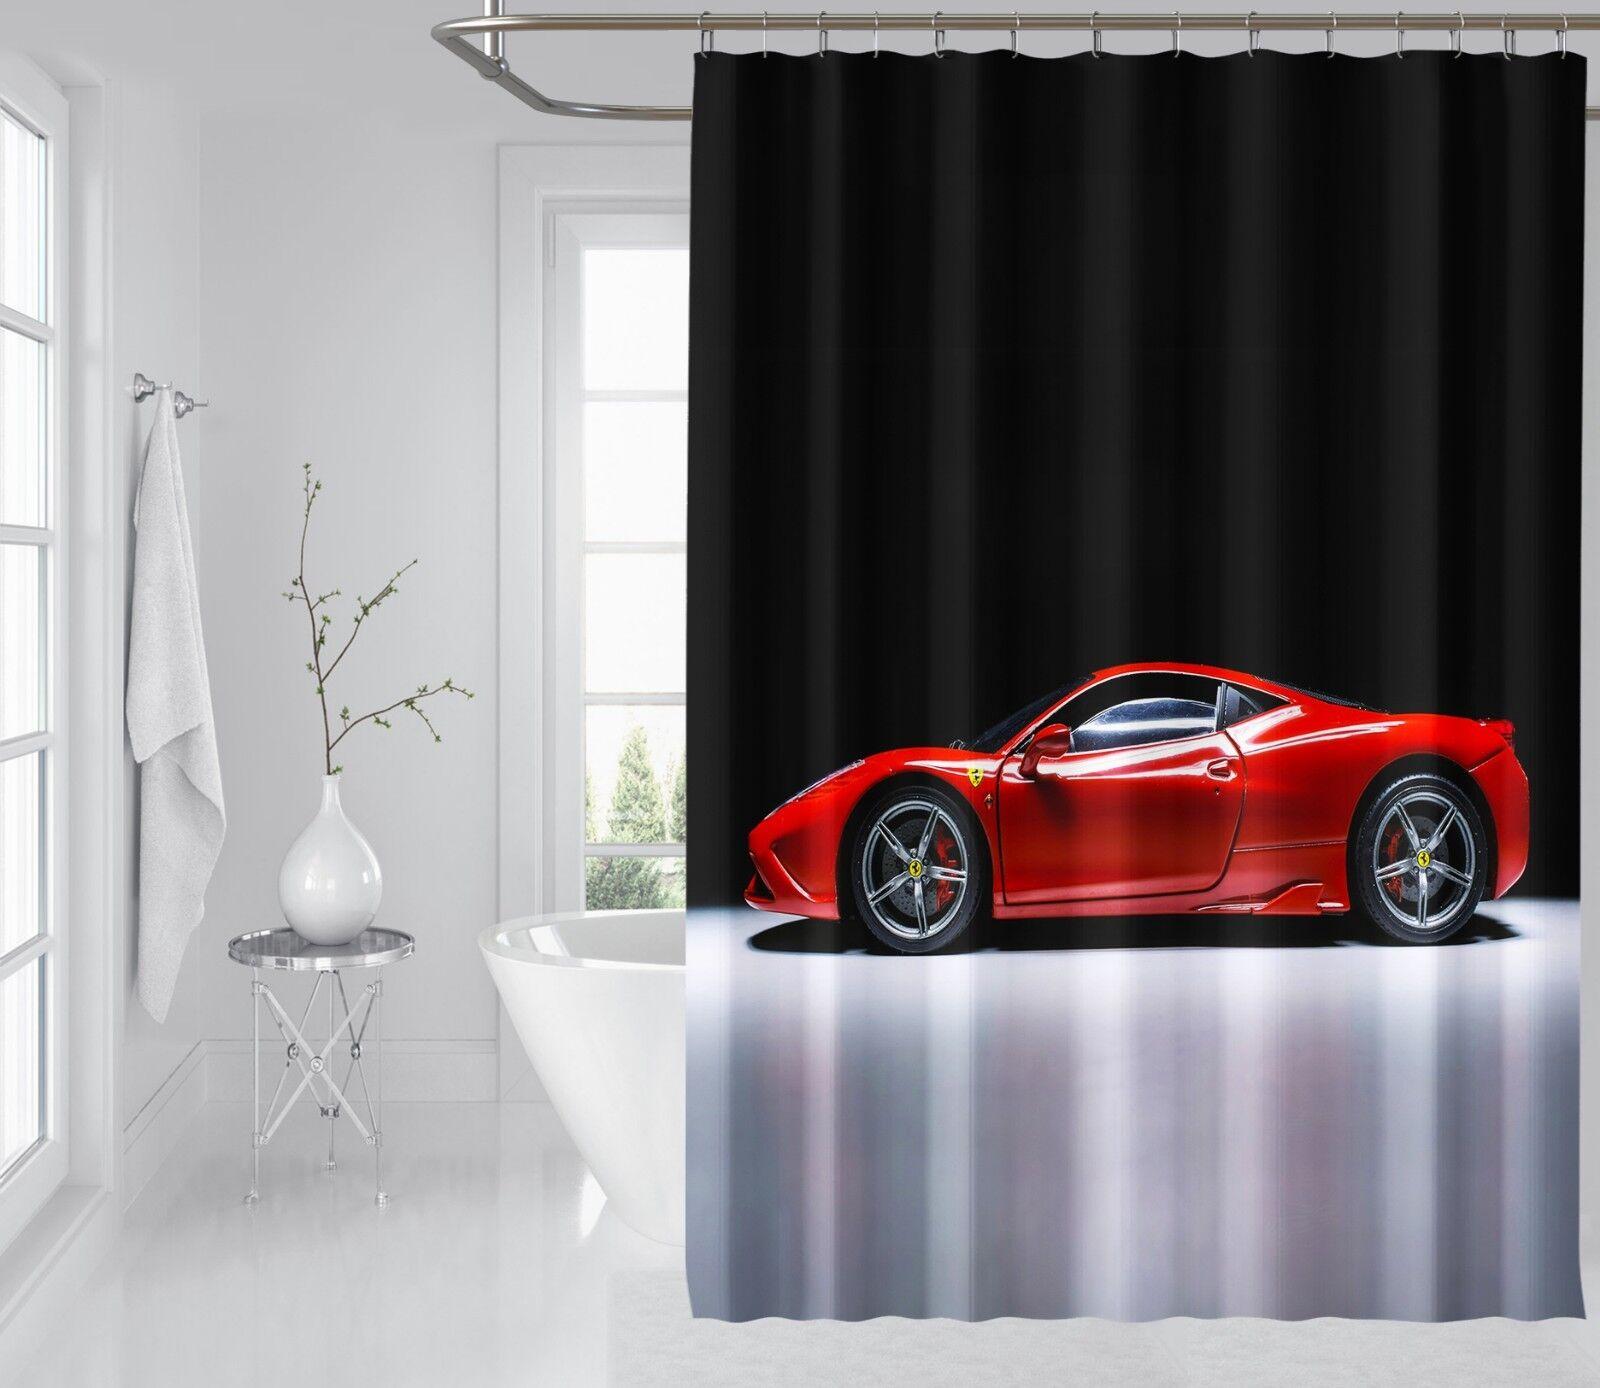 3D rot Car 654 Shower Curtain Waterproof Fiber Fiber Fiber Bathroom Home Windows Toilet e75c26